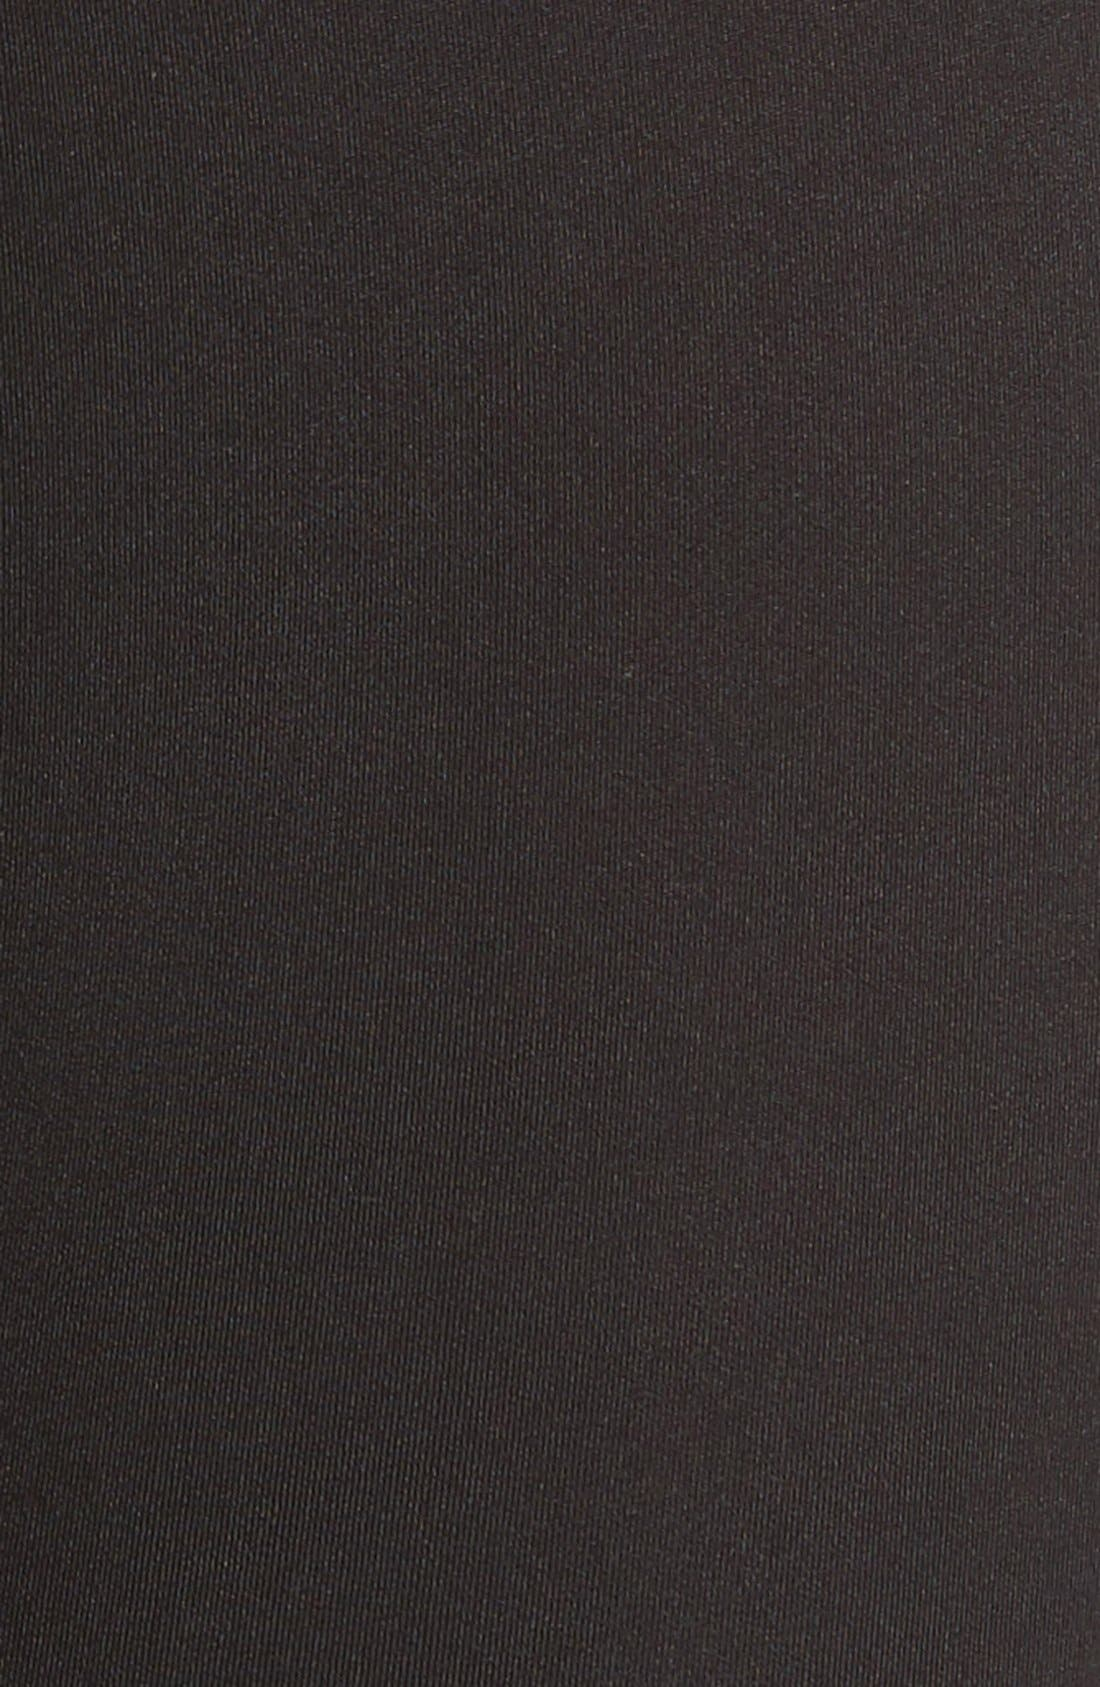 Liquid Stretch Microfiber Boxer Briefs,                             Alternate thumbnail 4, color,                             001